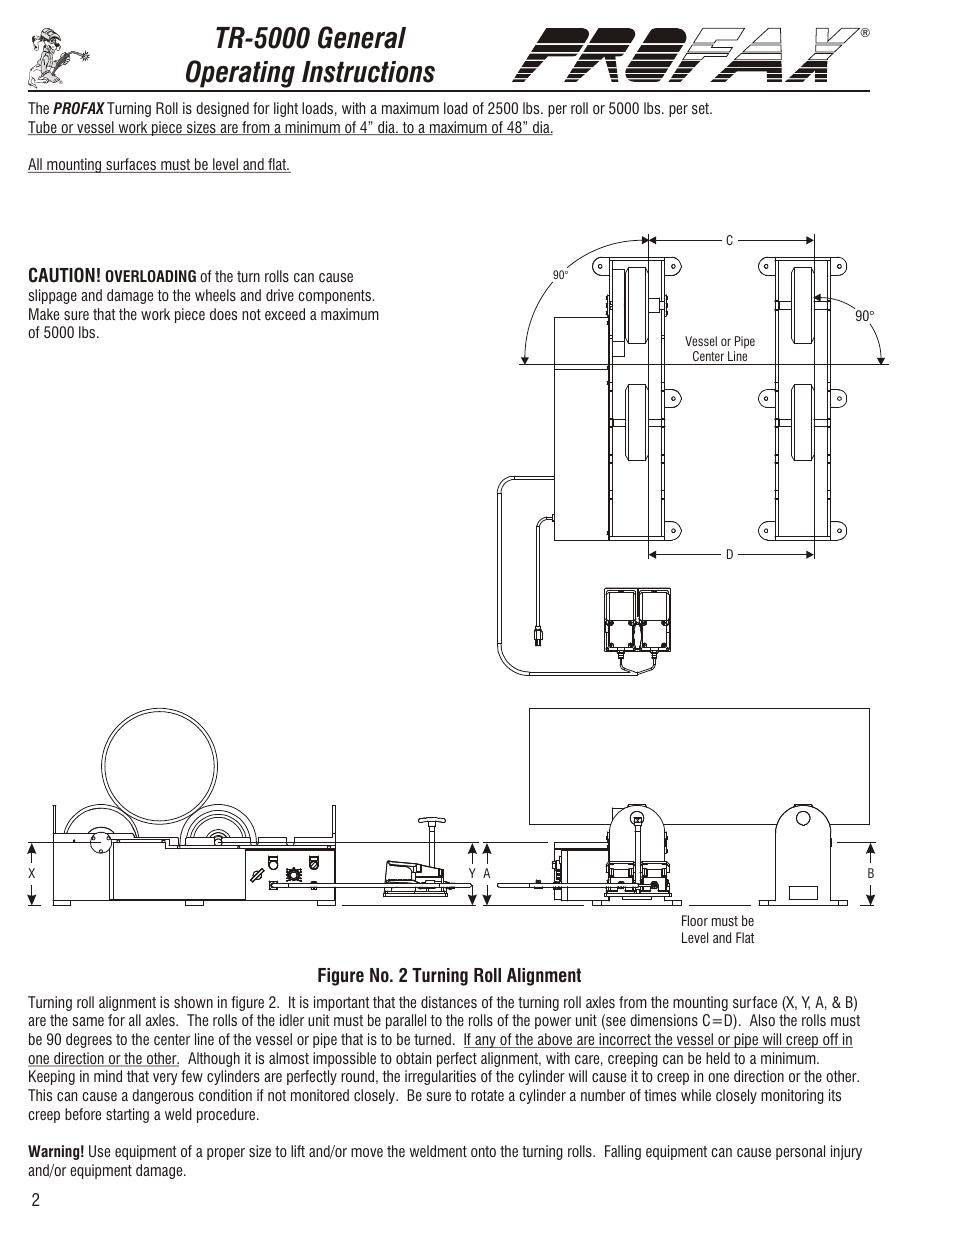 medium resolution of tr 5000 general operating instructions control panel wiring diagram figure no